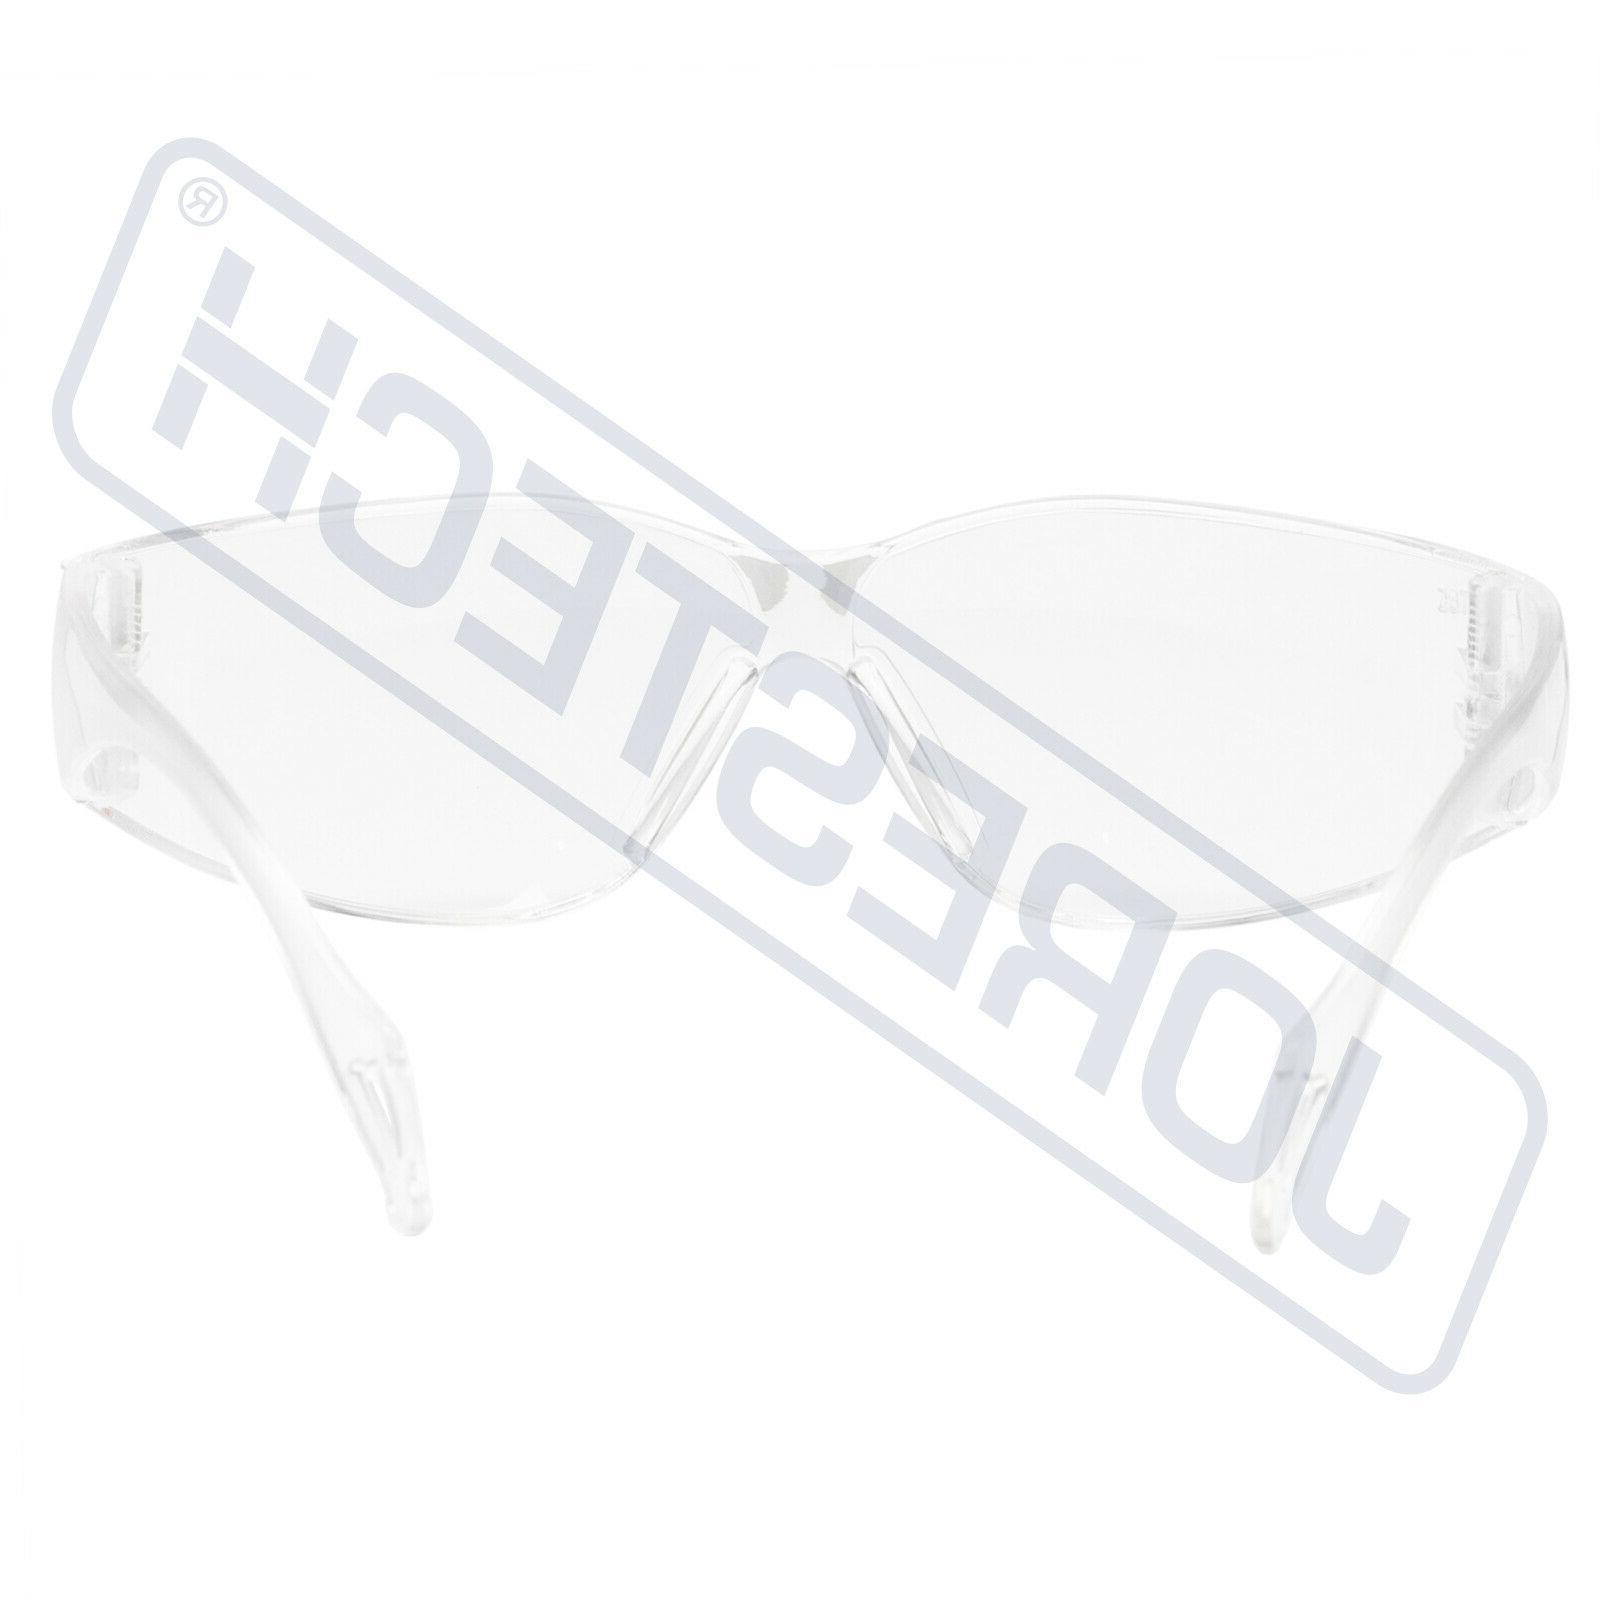 KIDS 12 PAIR JORESTECH CLEAR UV LOT SAFETY GLASSES